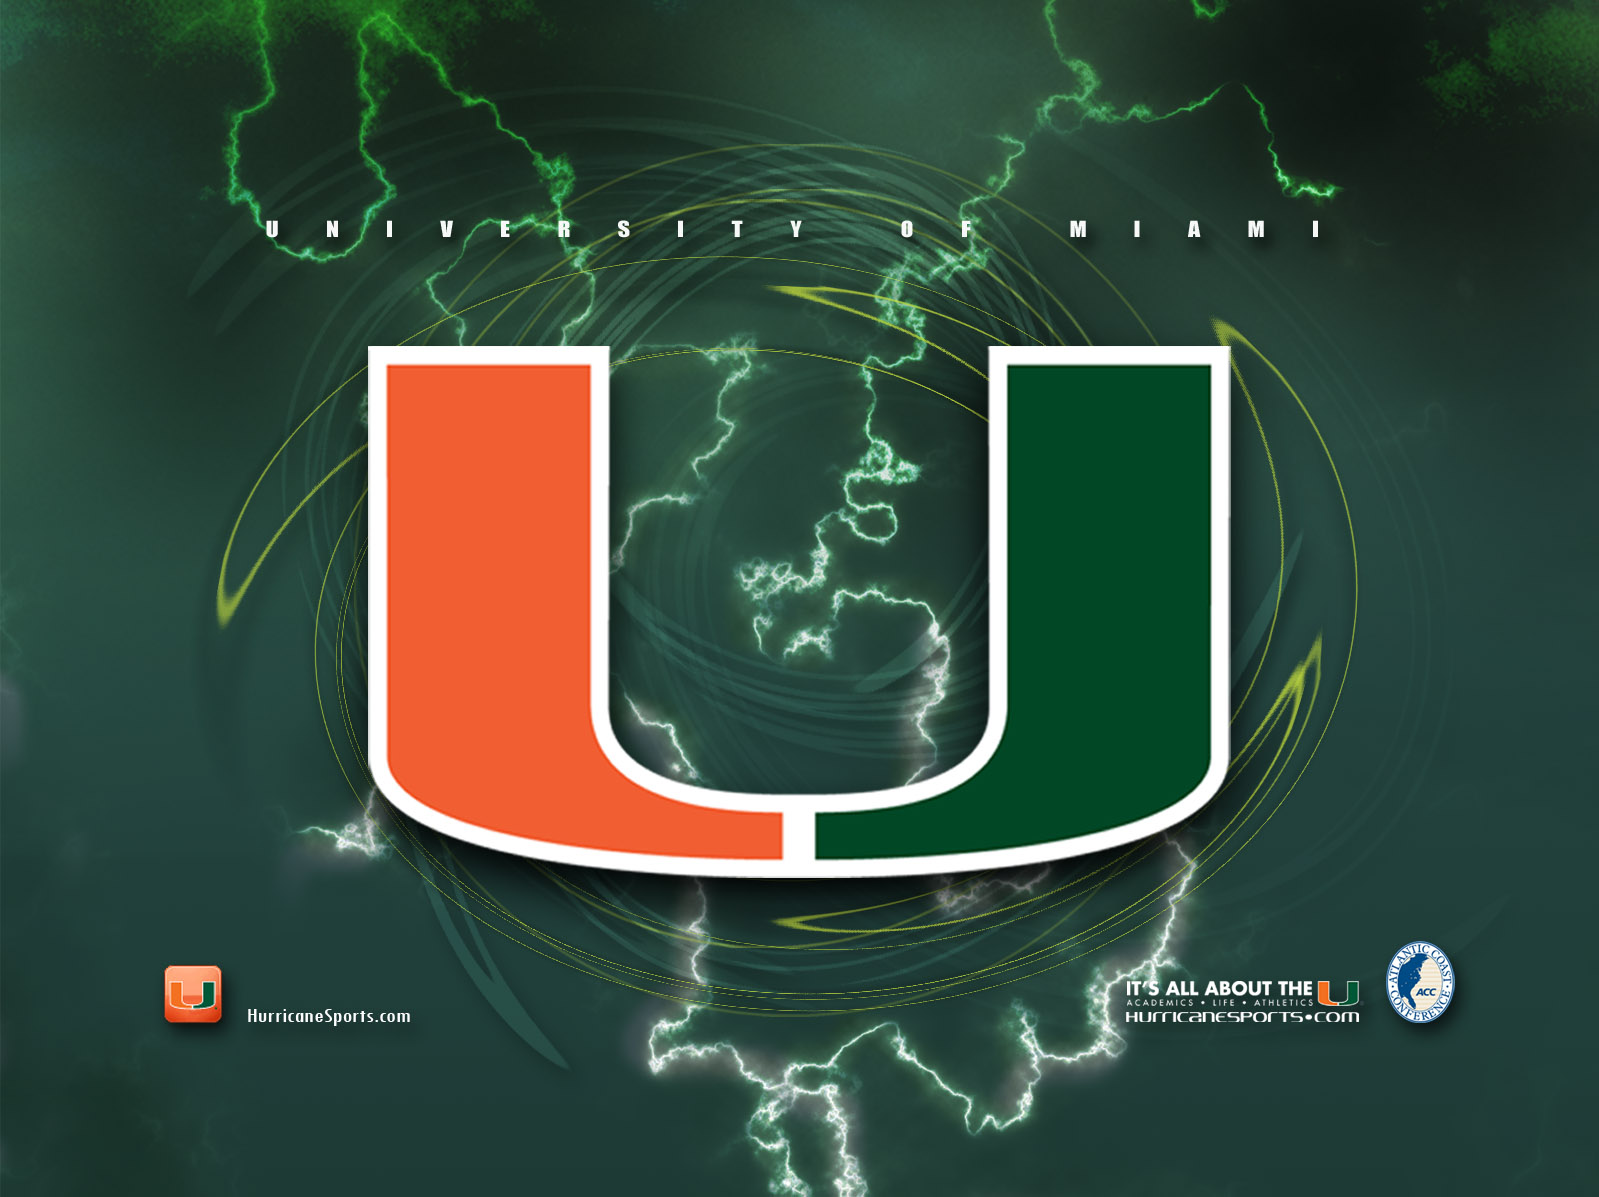 Miami Hurricanes The U 1600 x 1200 1280 x 800 1599x1197